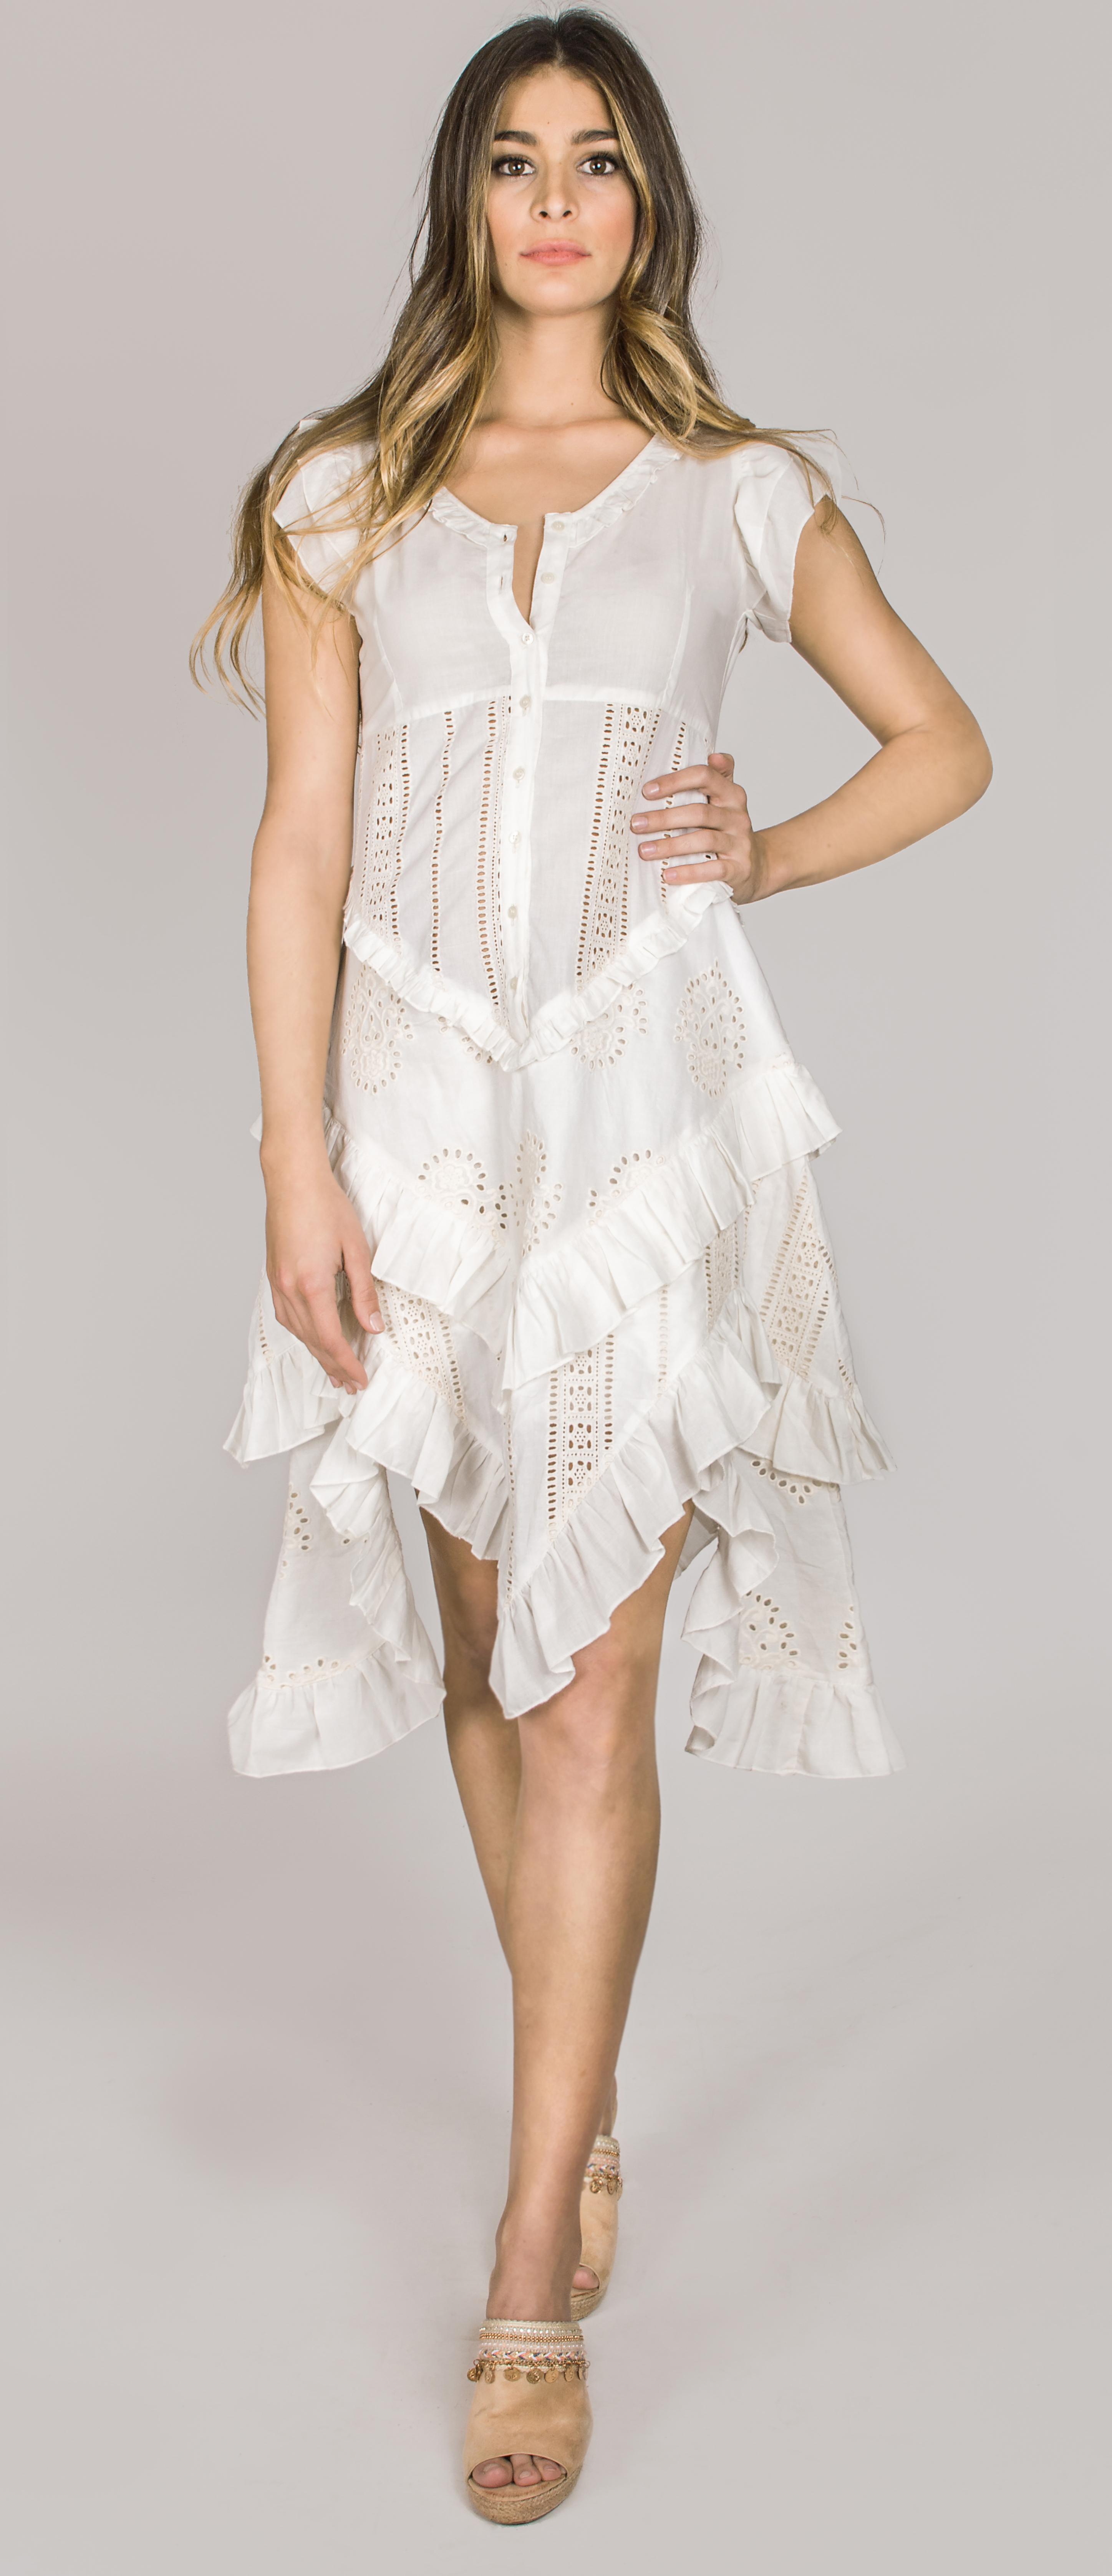 Shoklett Spain: Asymmetrical Princess Alysha Midi Dress SOLD OUT SHOKLETT_10074S19DR